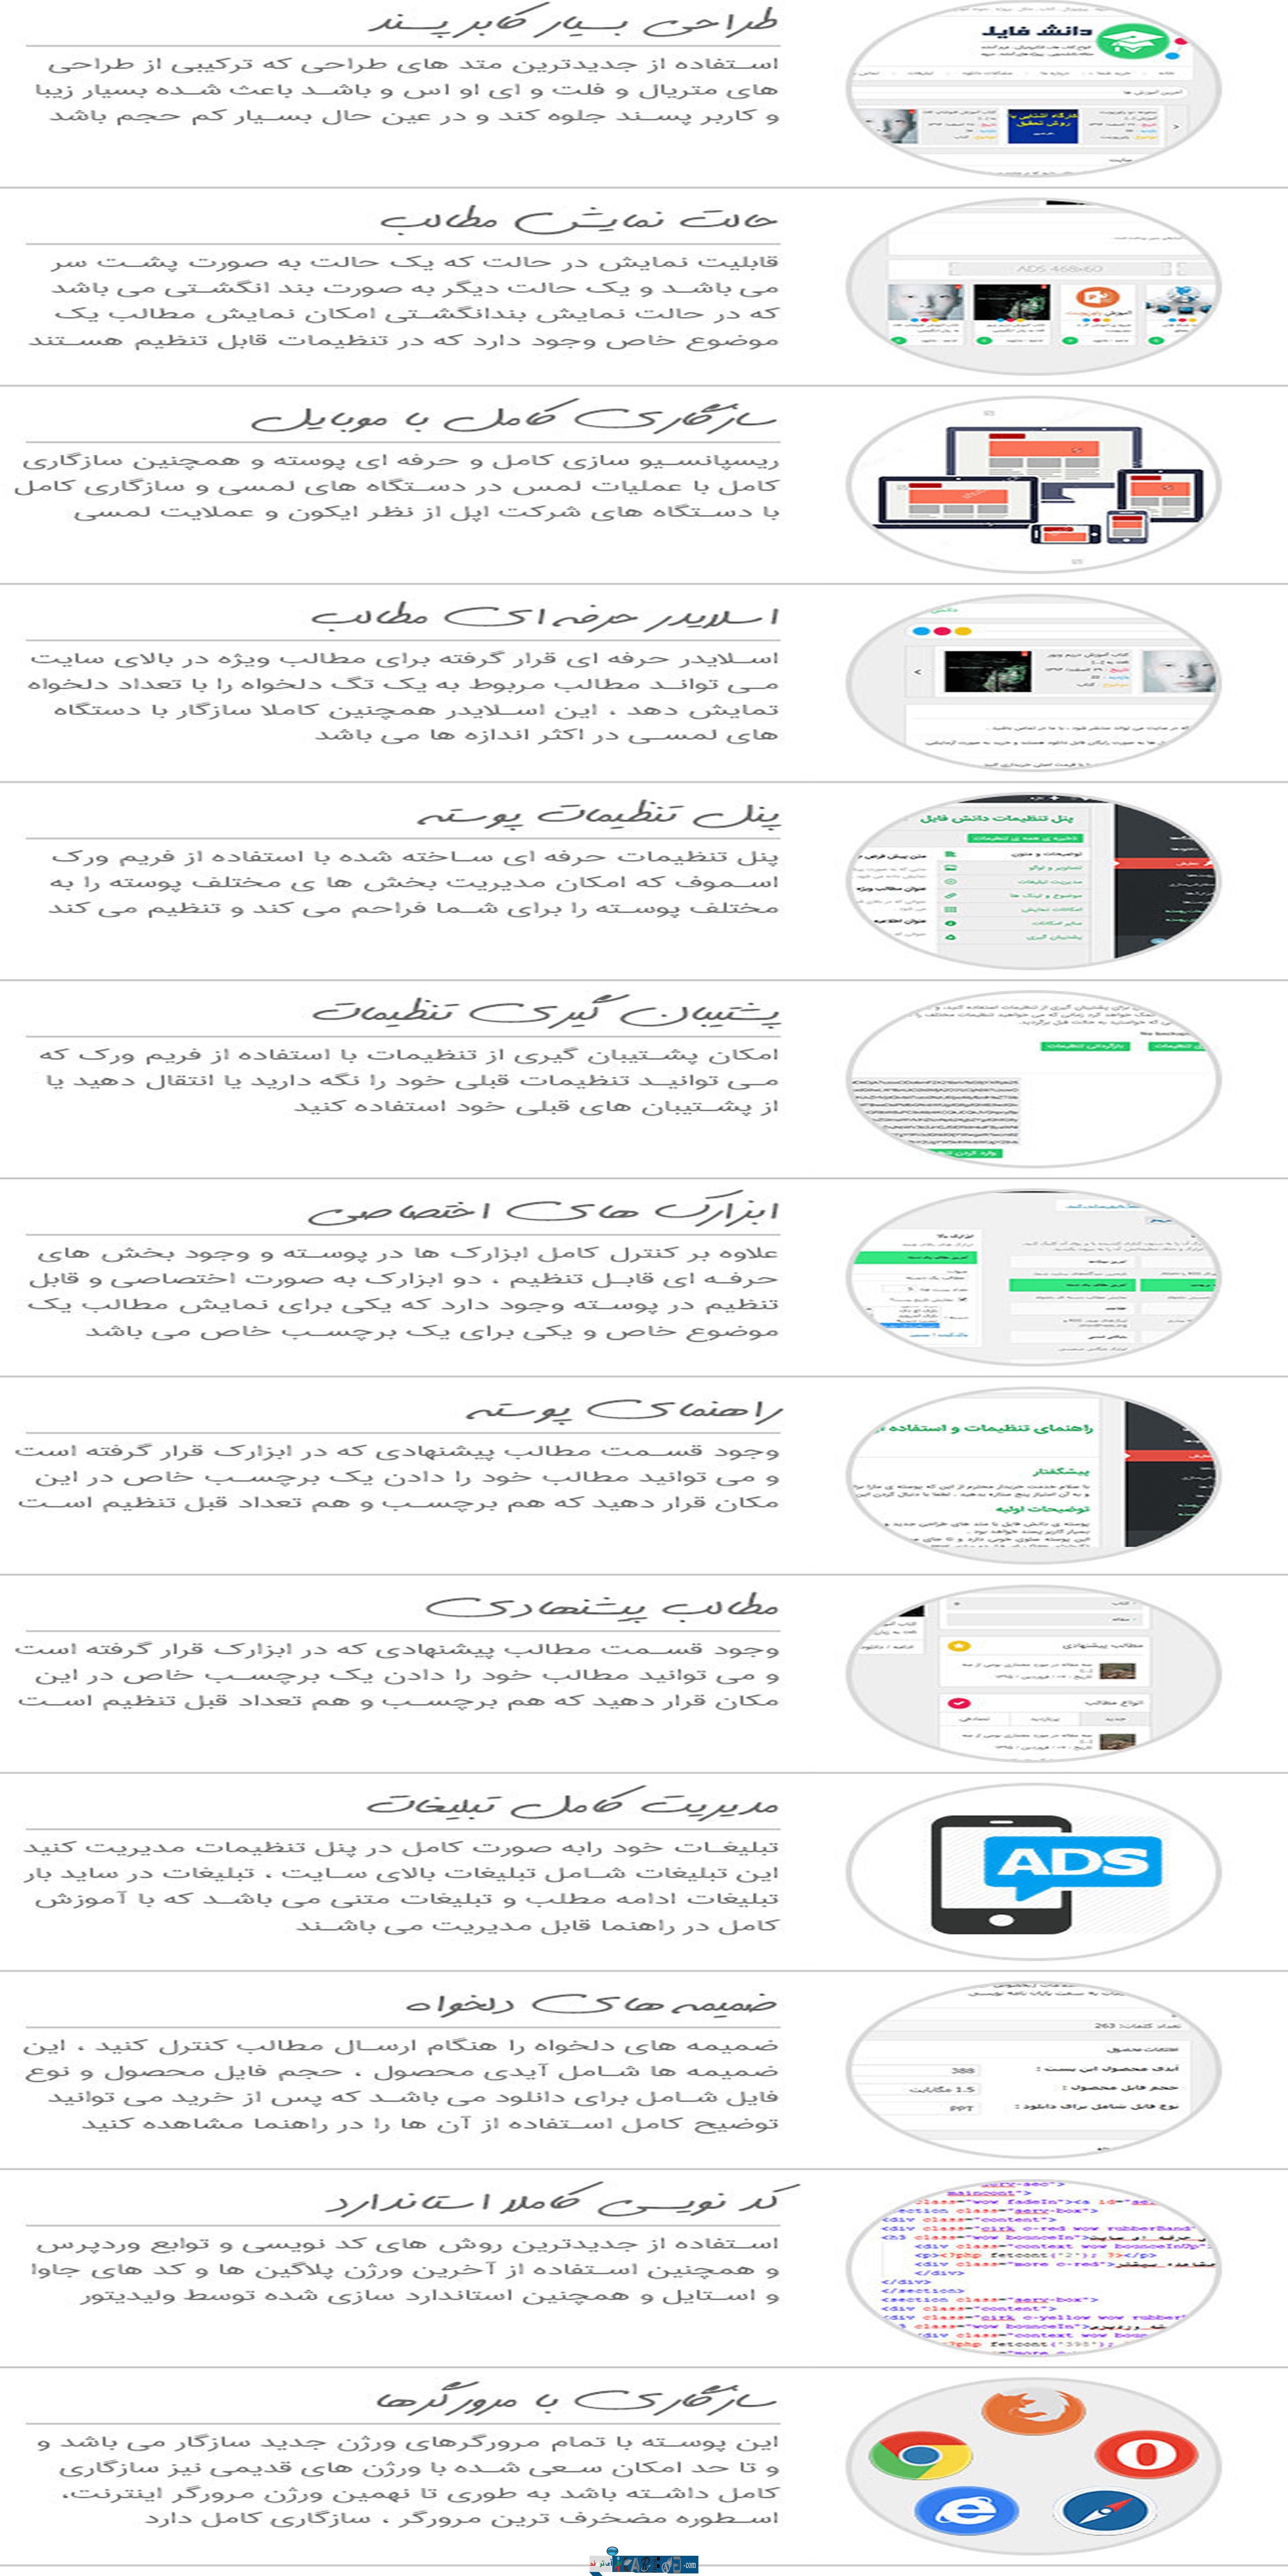 itarfand-63 قالب دانش فایل / DaneshFile برای وردپرس